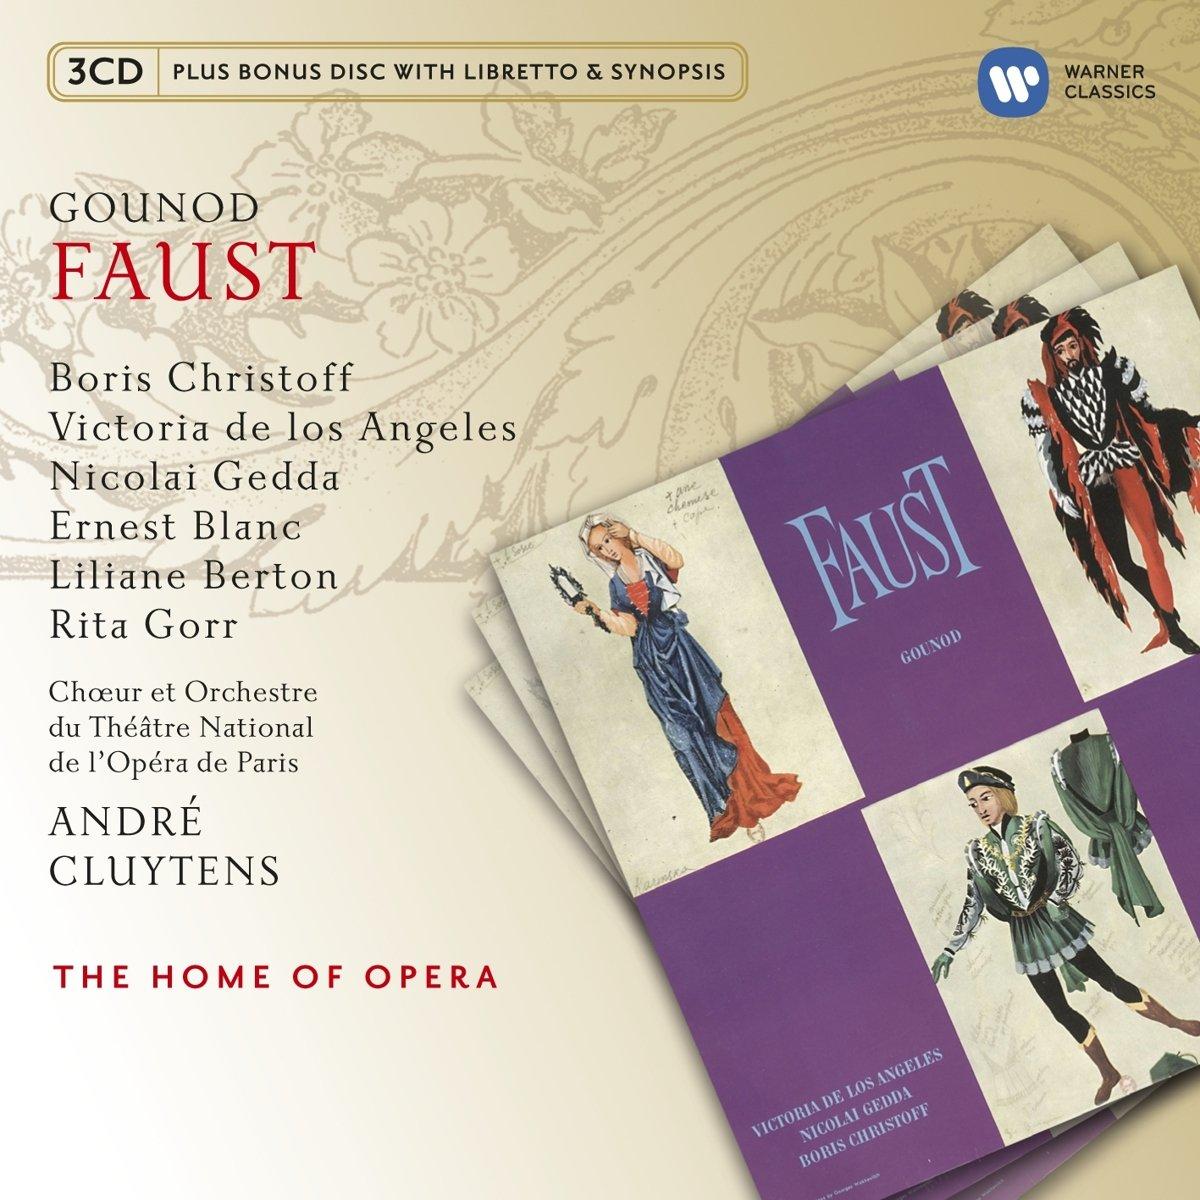 Gounod: Faust by EMI CLASSICS